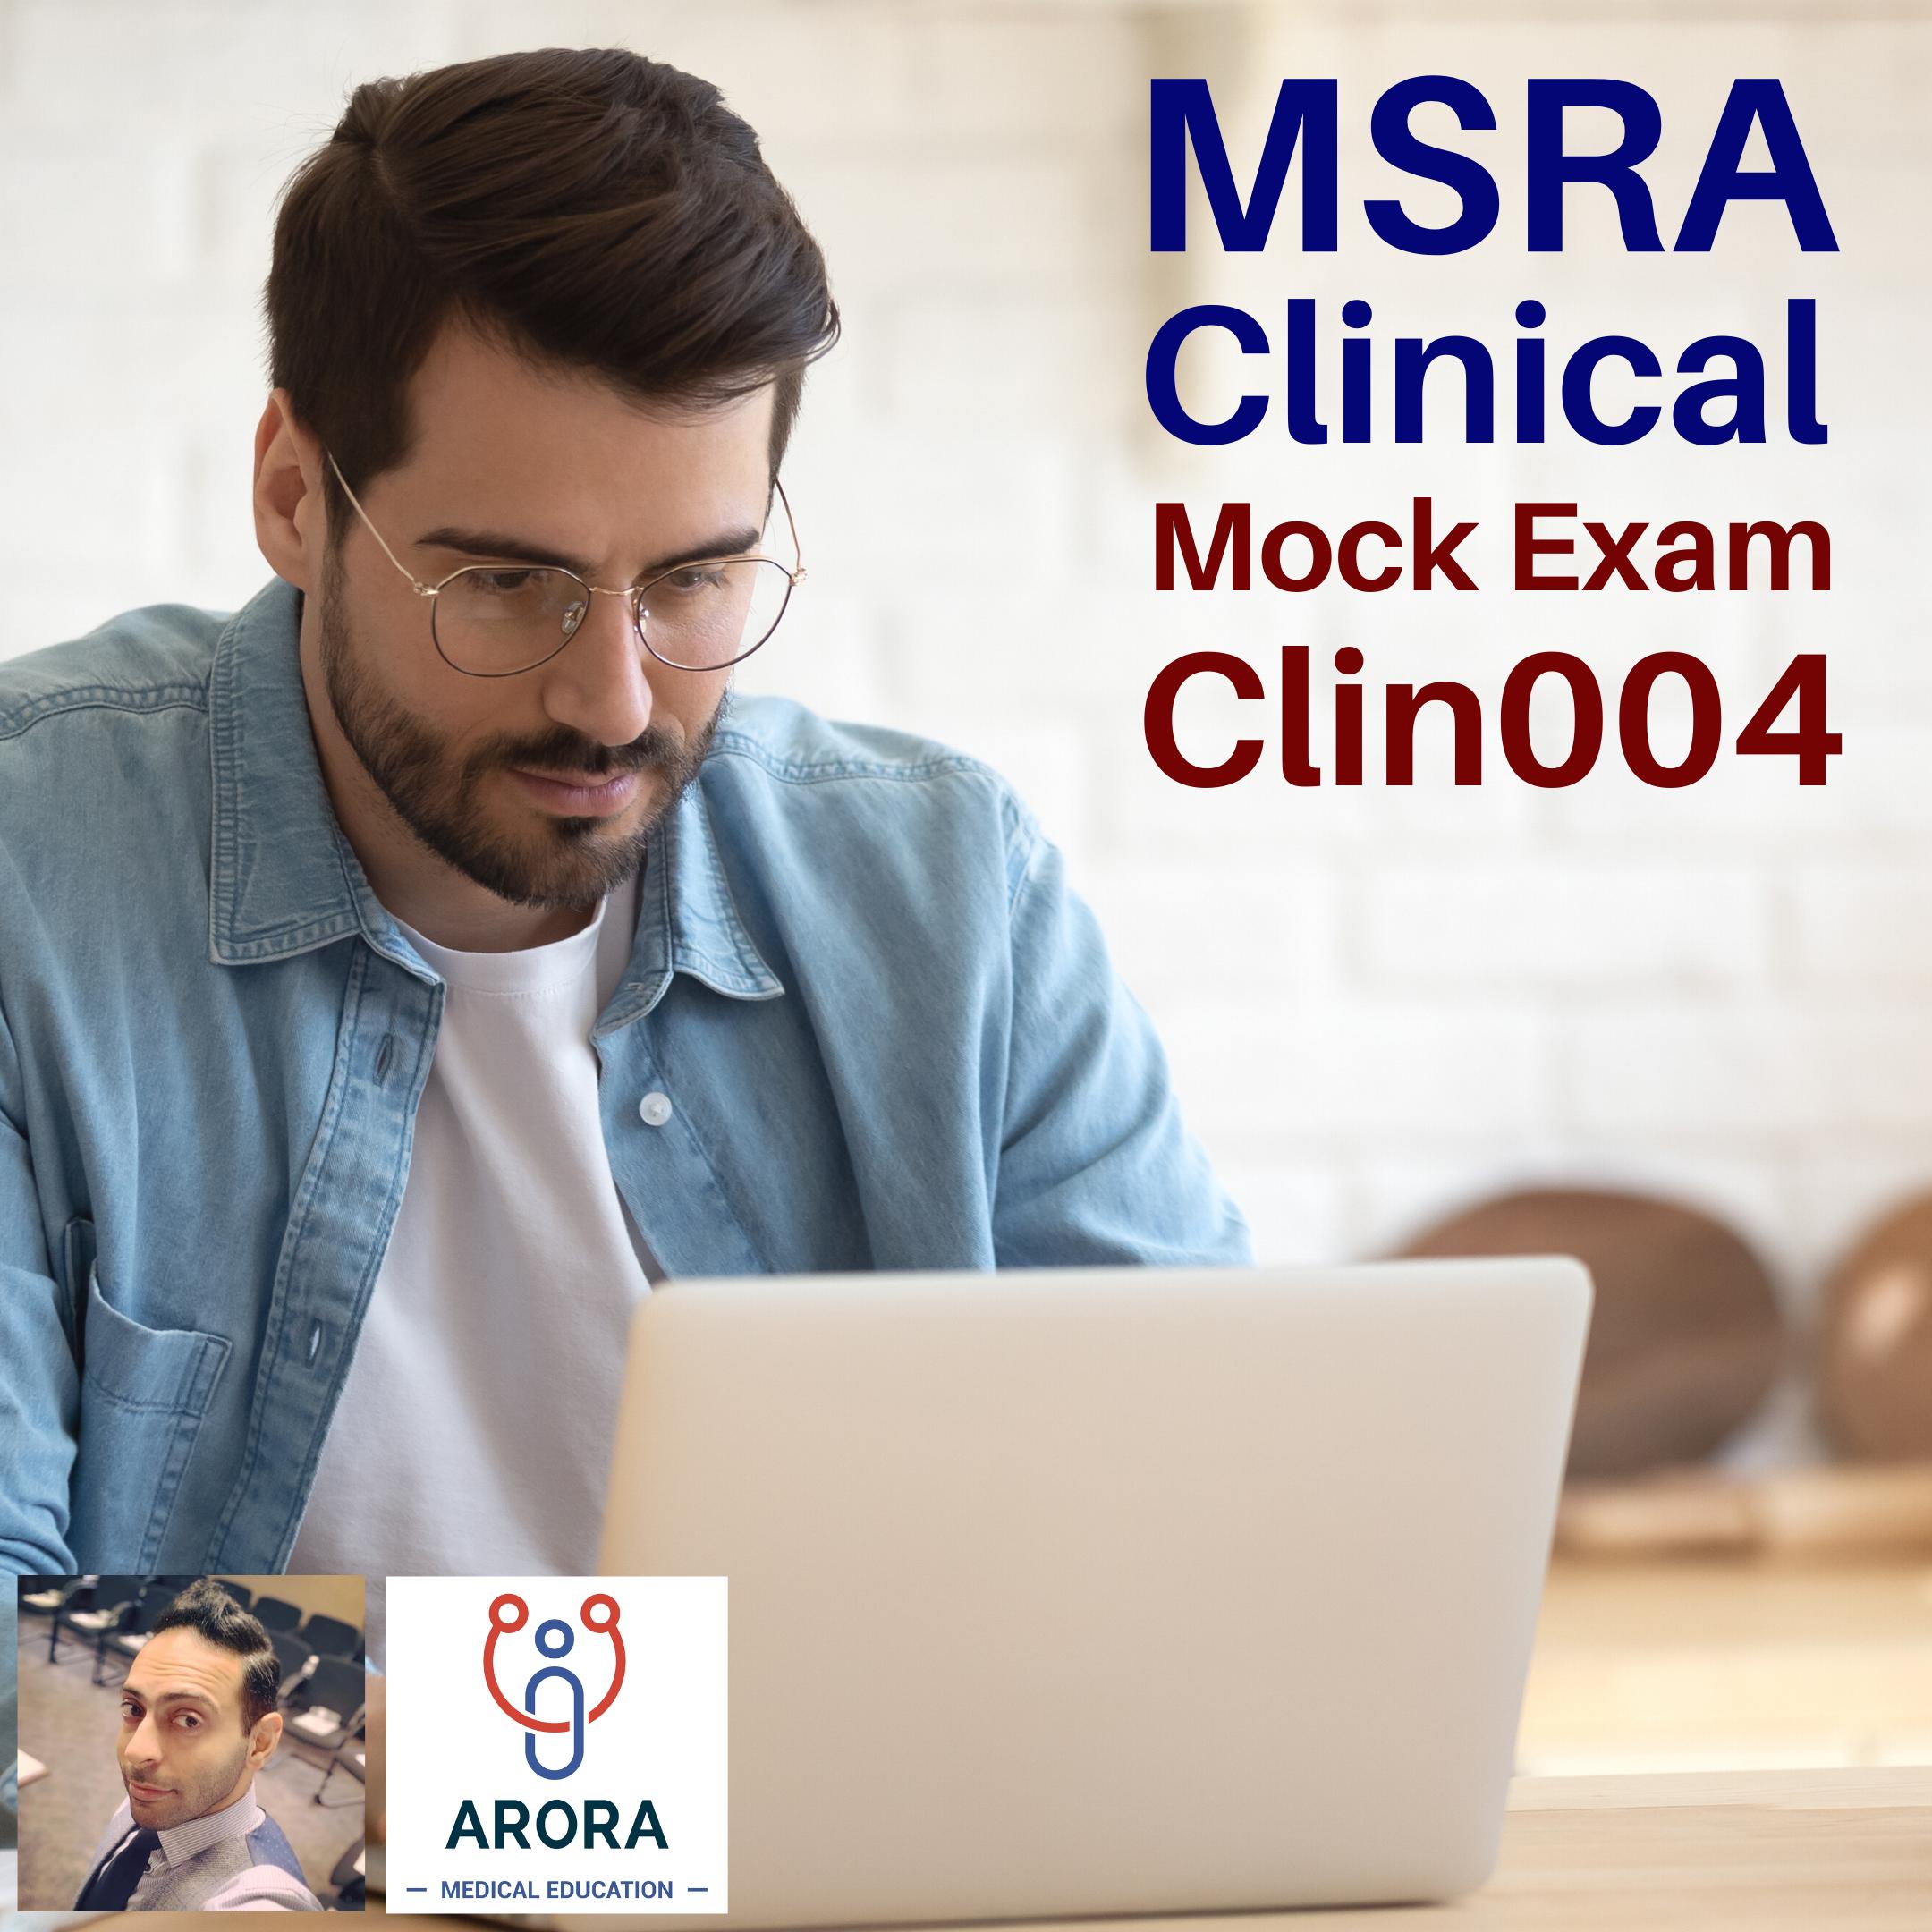 MSRA CLIN 4 - MRCGP CSA, AKT and PLAB Exam Courses and Online Webinars - Arora Medical Education